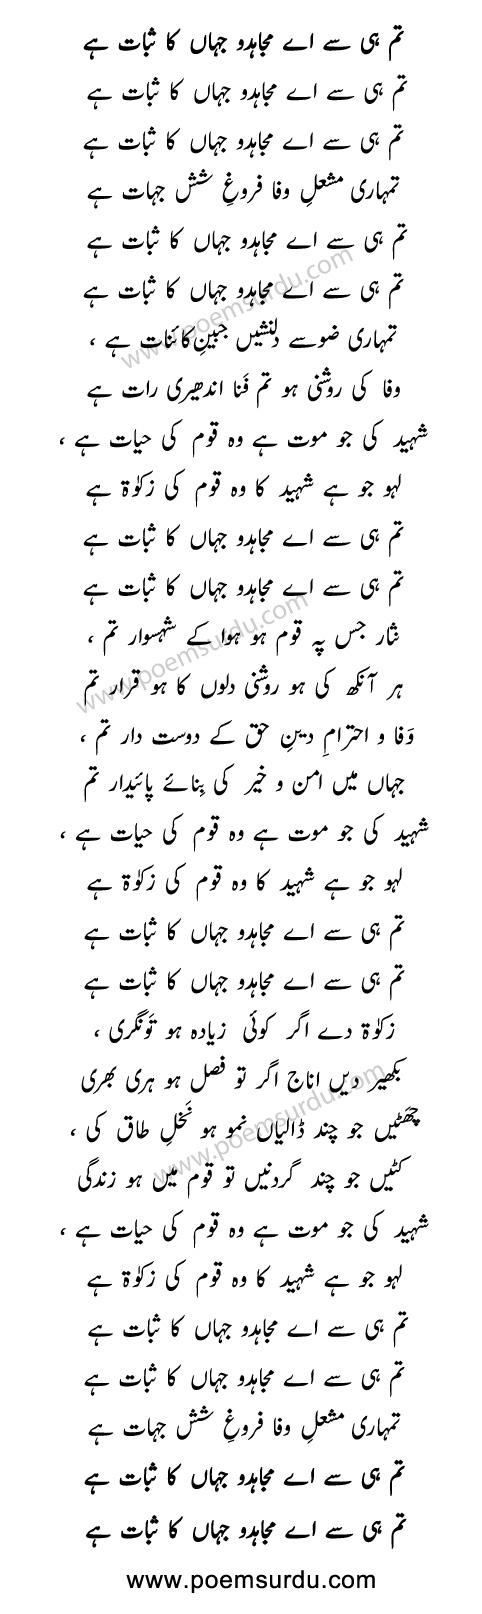 Tum Hi Se Aye Mujahido Lyrics in Urdu